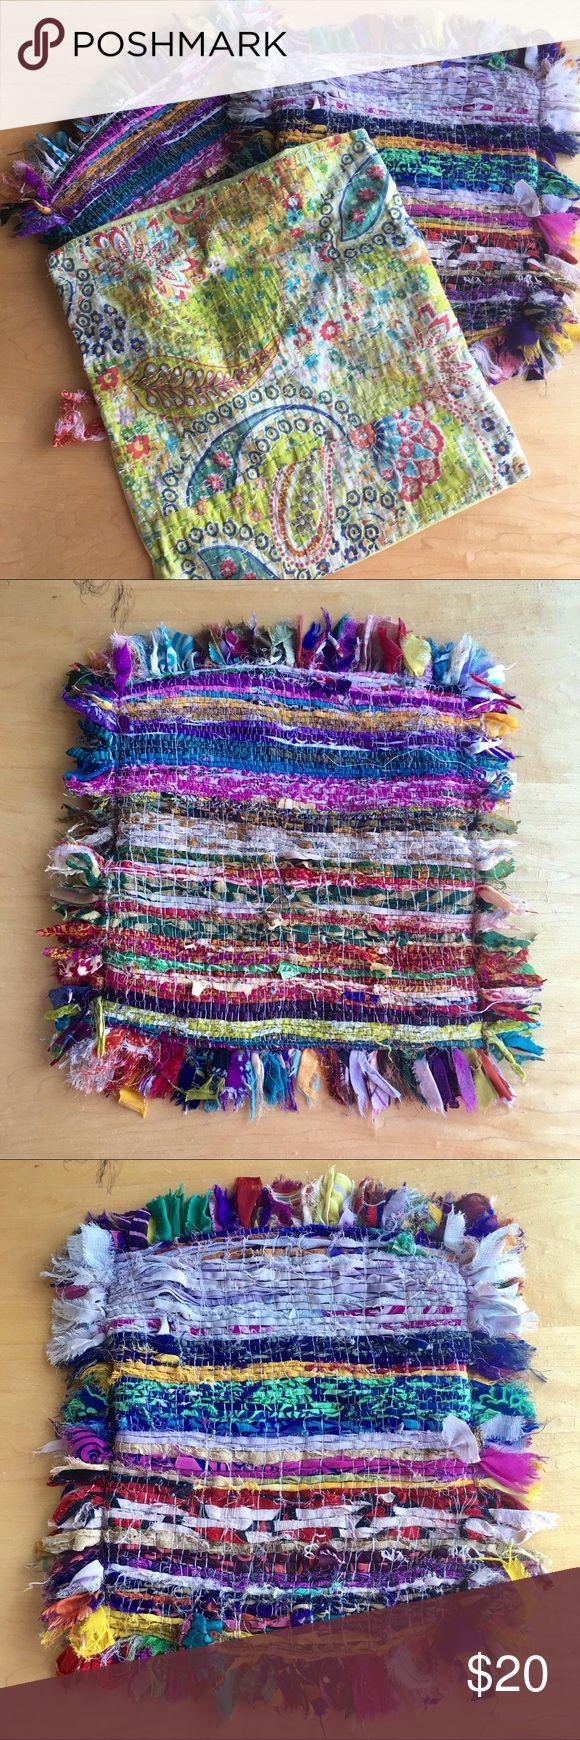 Cute Bohemian Throw Pillows : 25+ best ideas about Purple Dorm Rooms on Pinterest Cozy dorm room, Girl dorm decor and ...